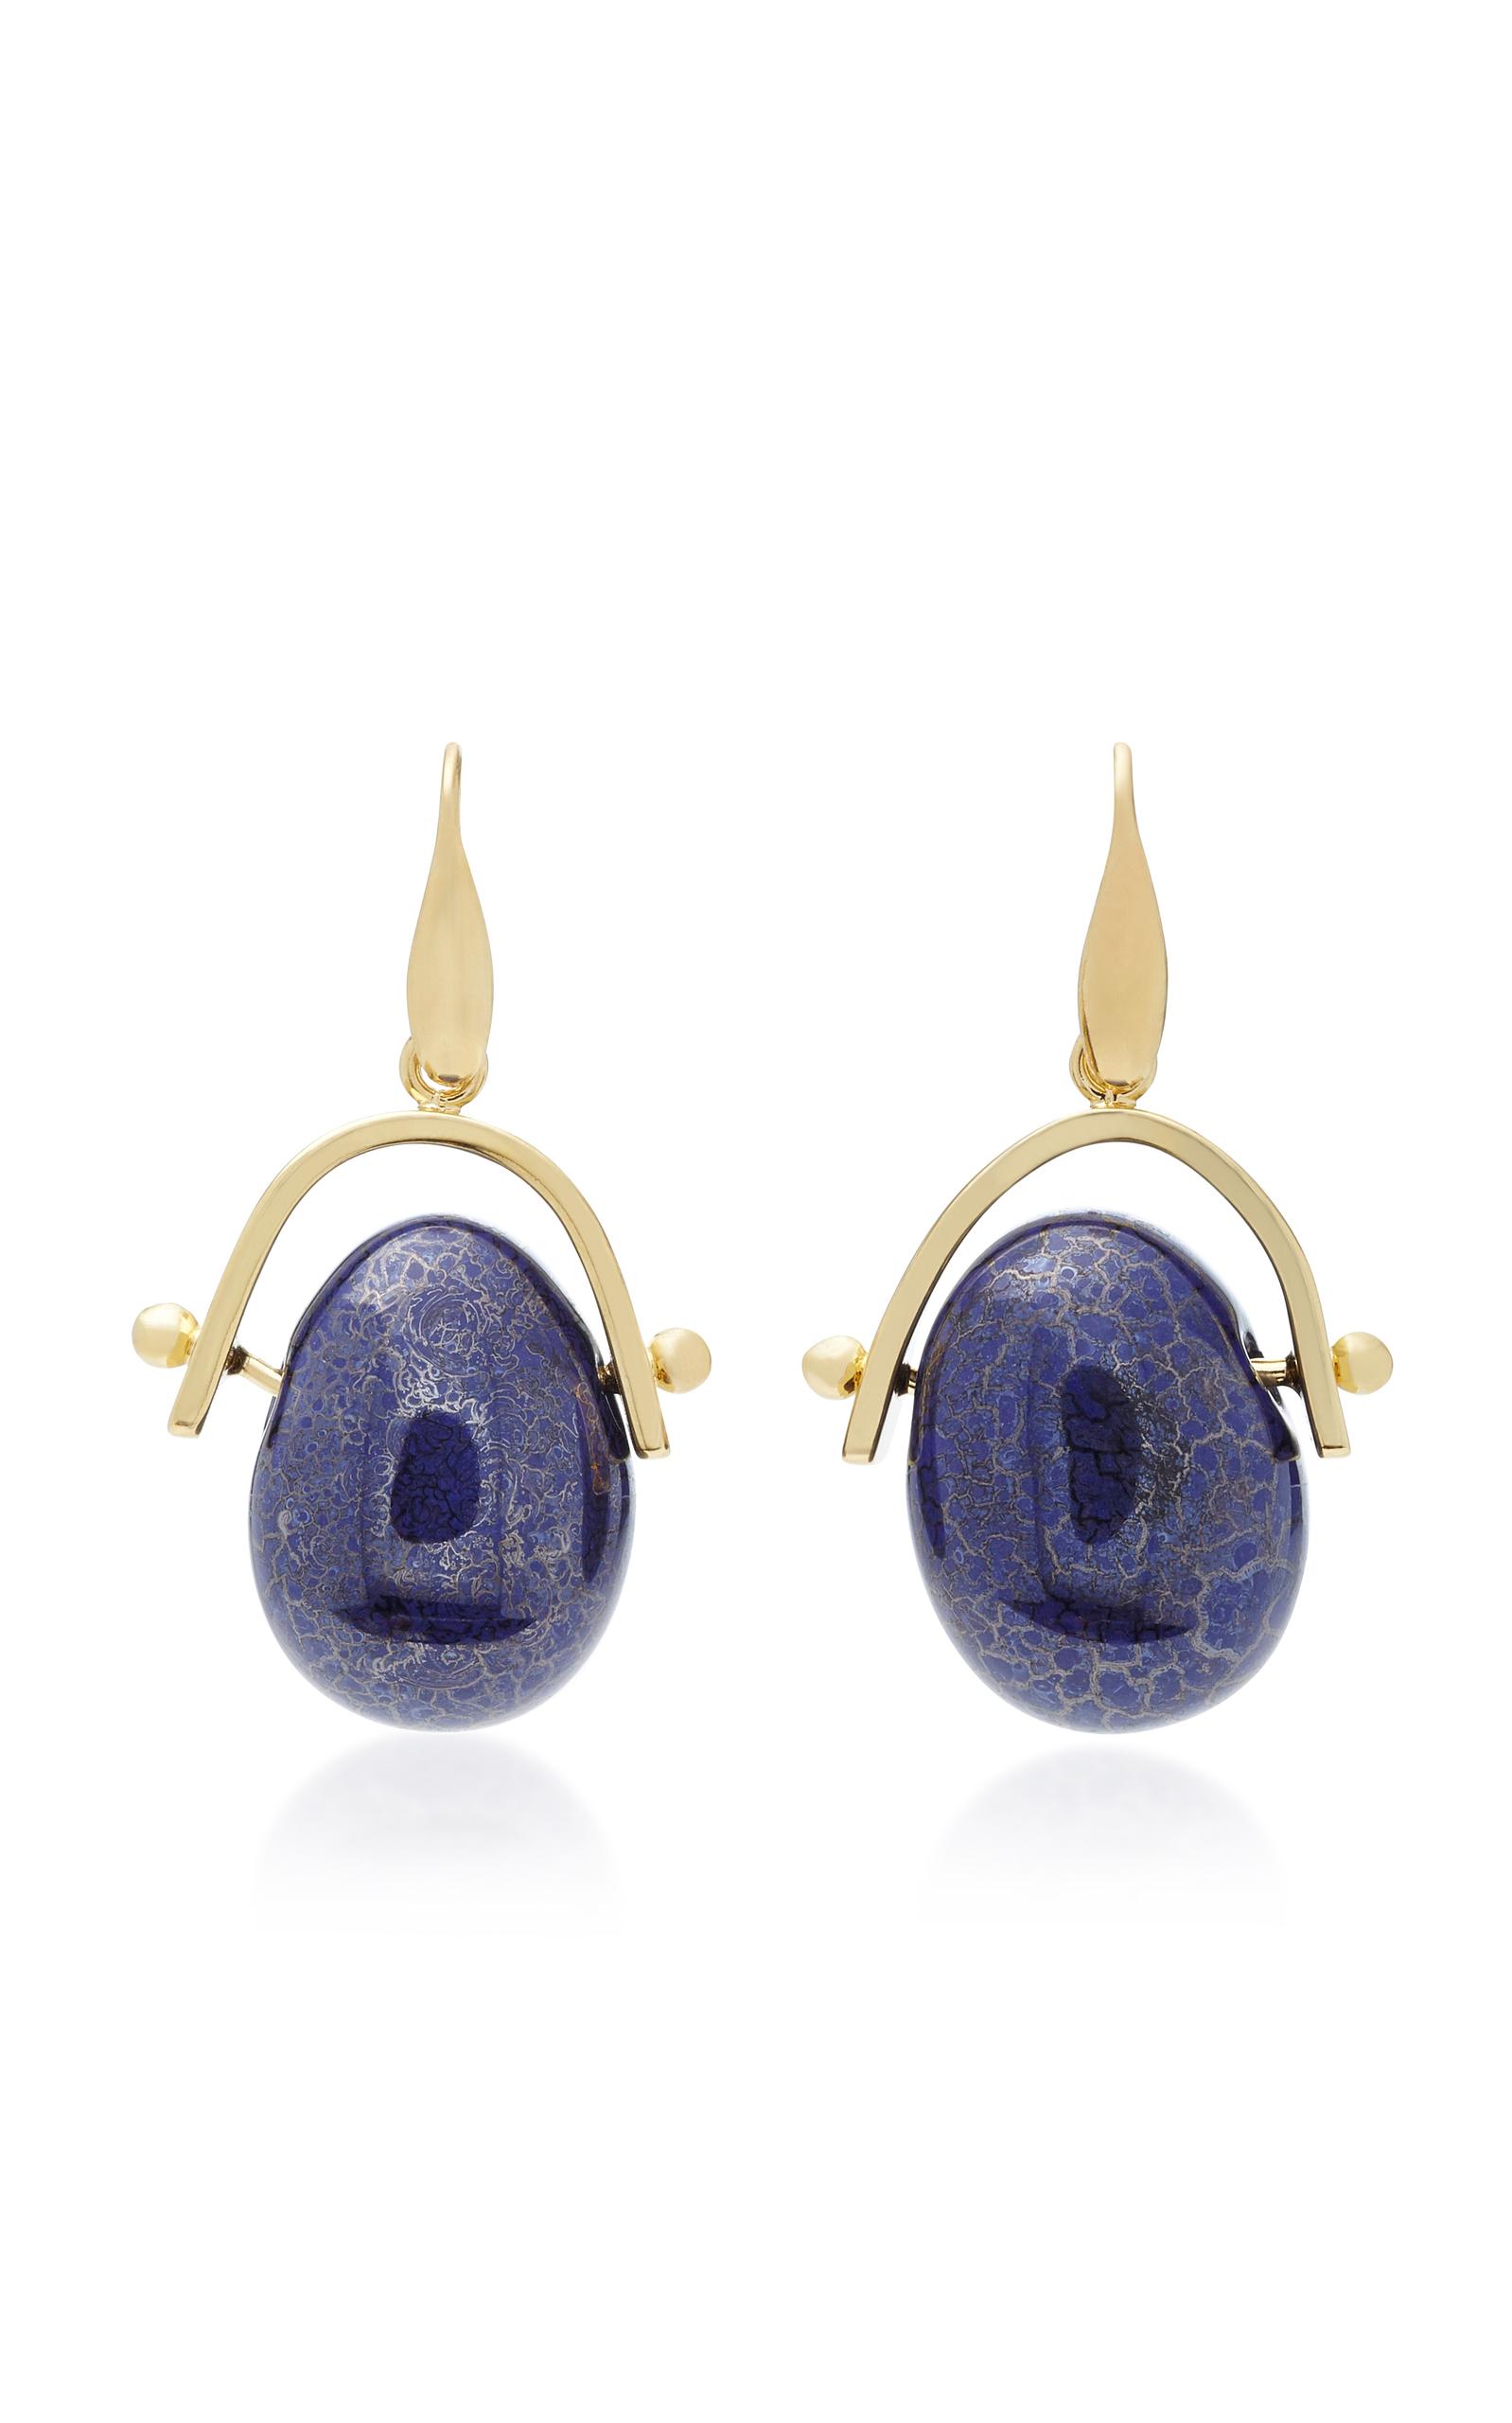 5f6119c76d Isabel Marant Gold-Tone Brass Pebble Earrings In Blue | ModeSens